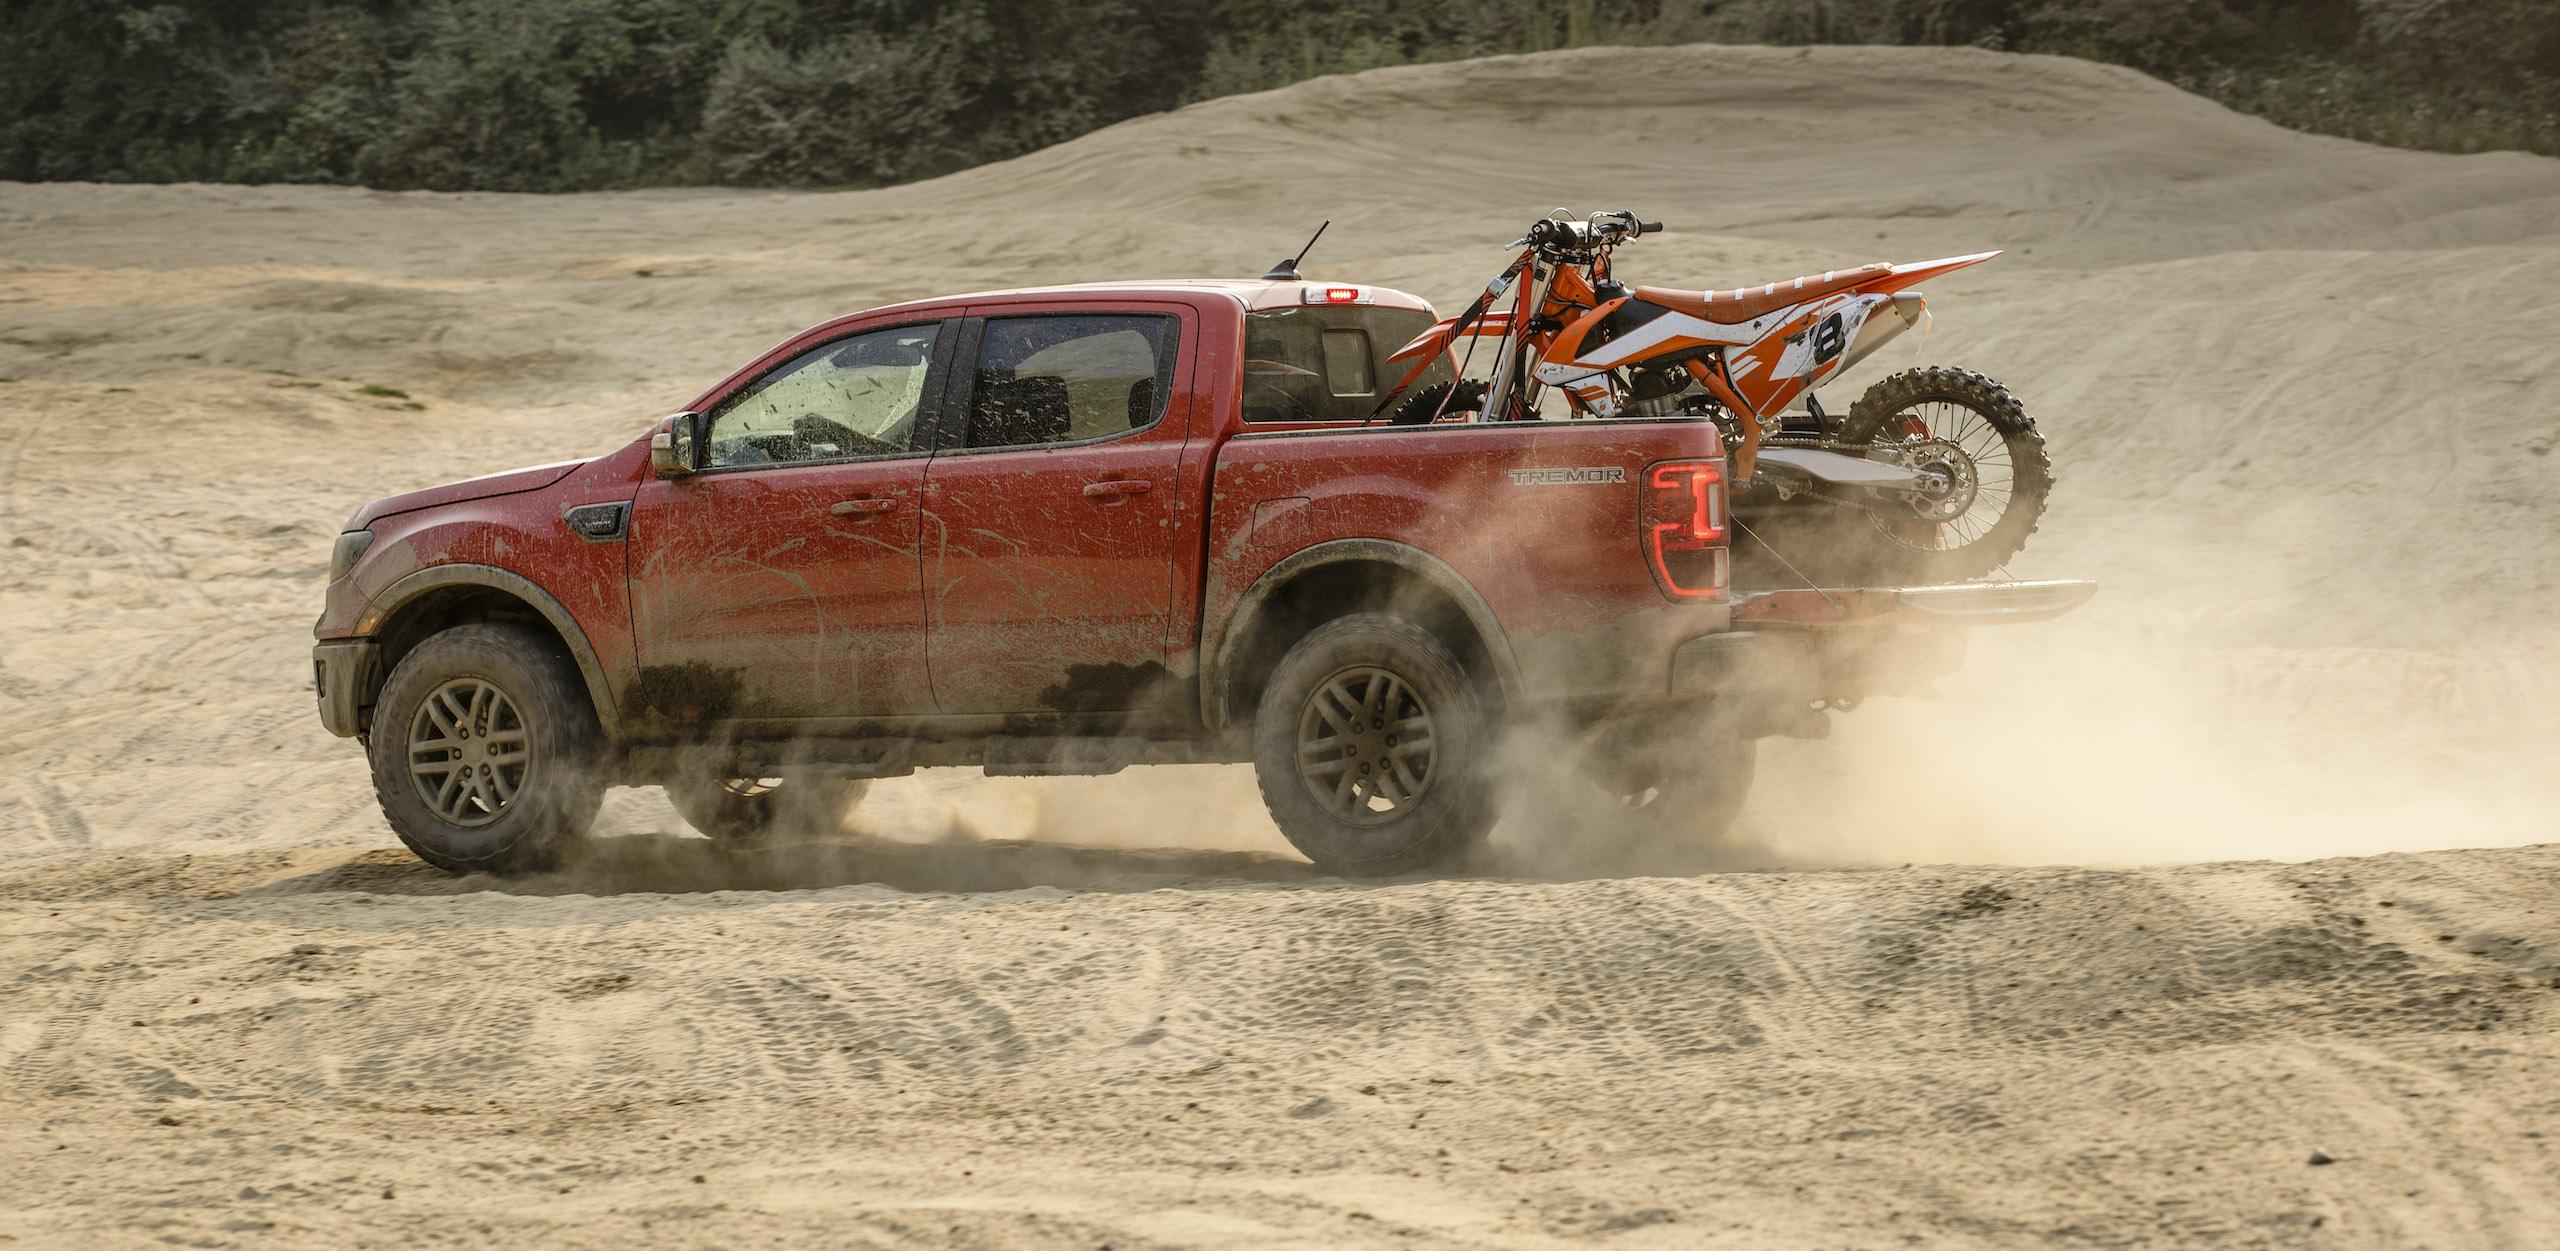 Ranger Tremor Lariat rear three-quarter off road dune action motorbike loaded in bed